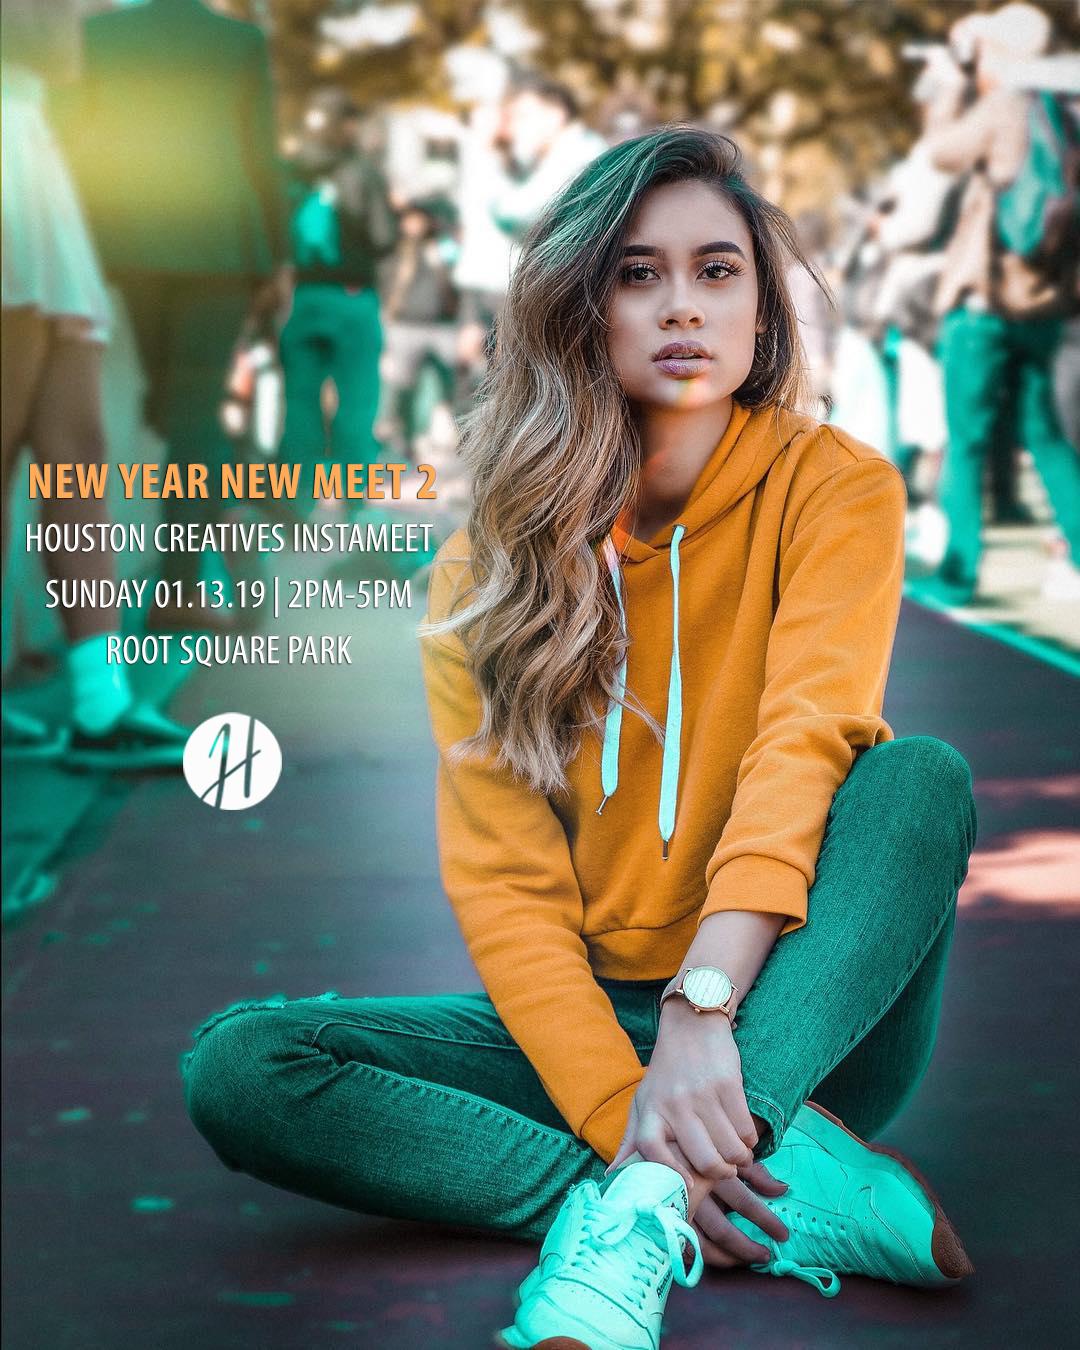 Houston Visuals New Year New Meet 2 Flyer